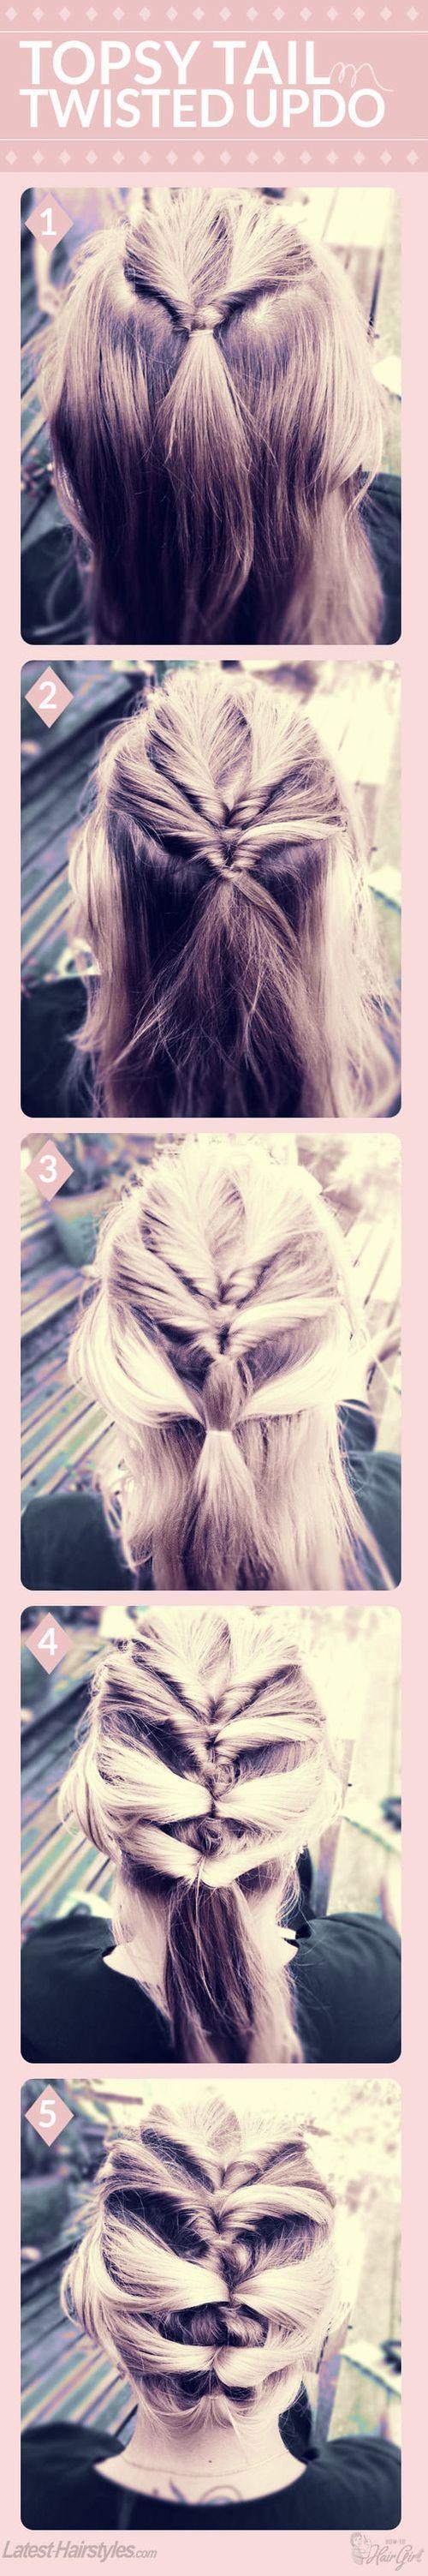 Hair Tutorials For Short Hair / fashionsy.com